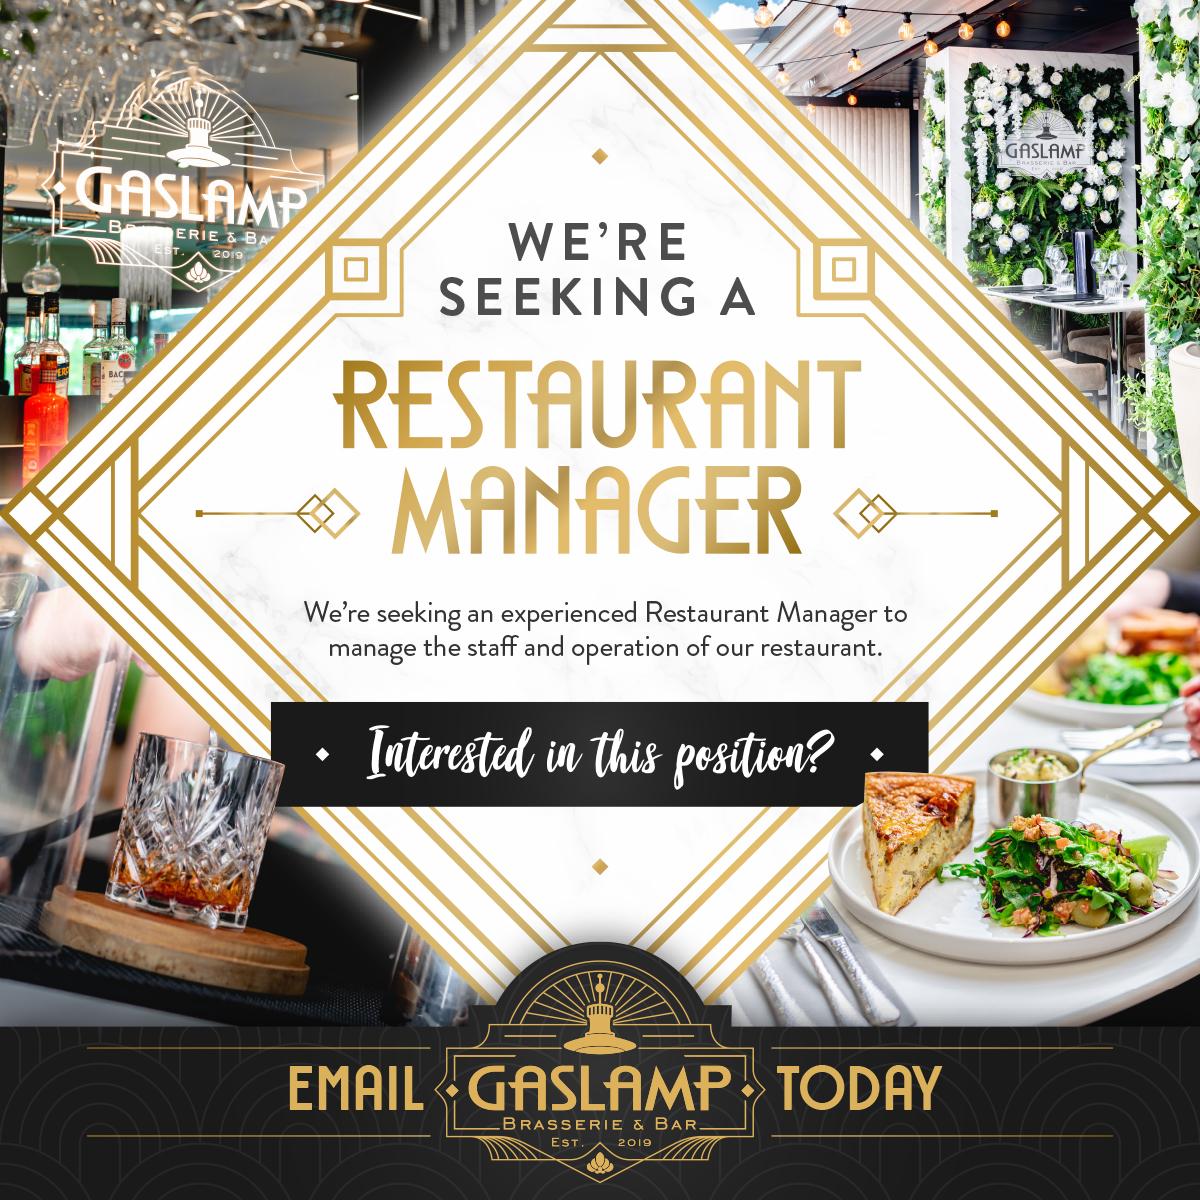 594 GL Restaurant Manager Position Social Media Post v2.1